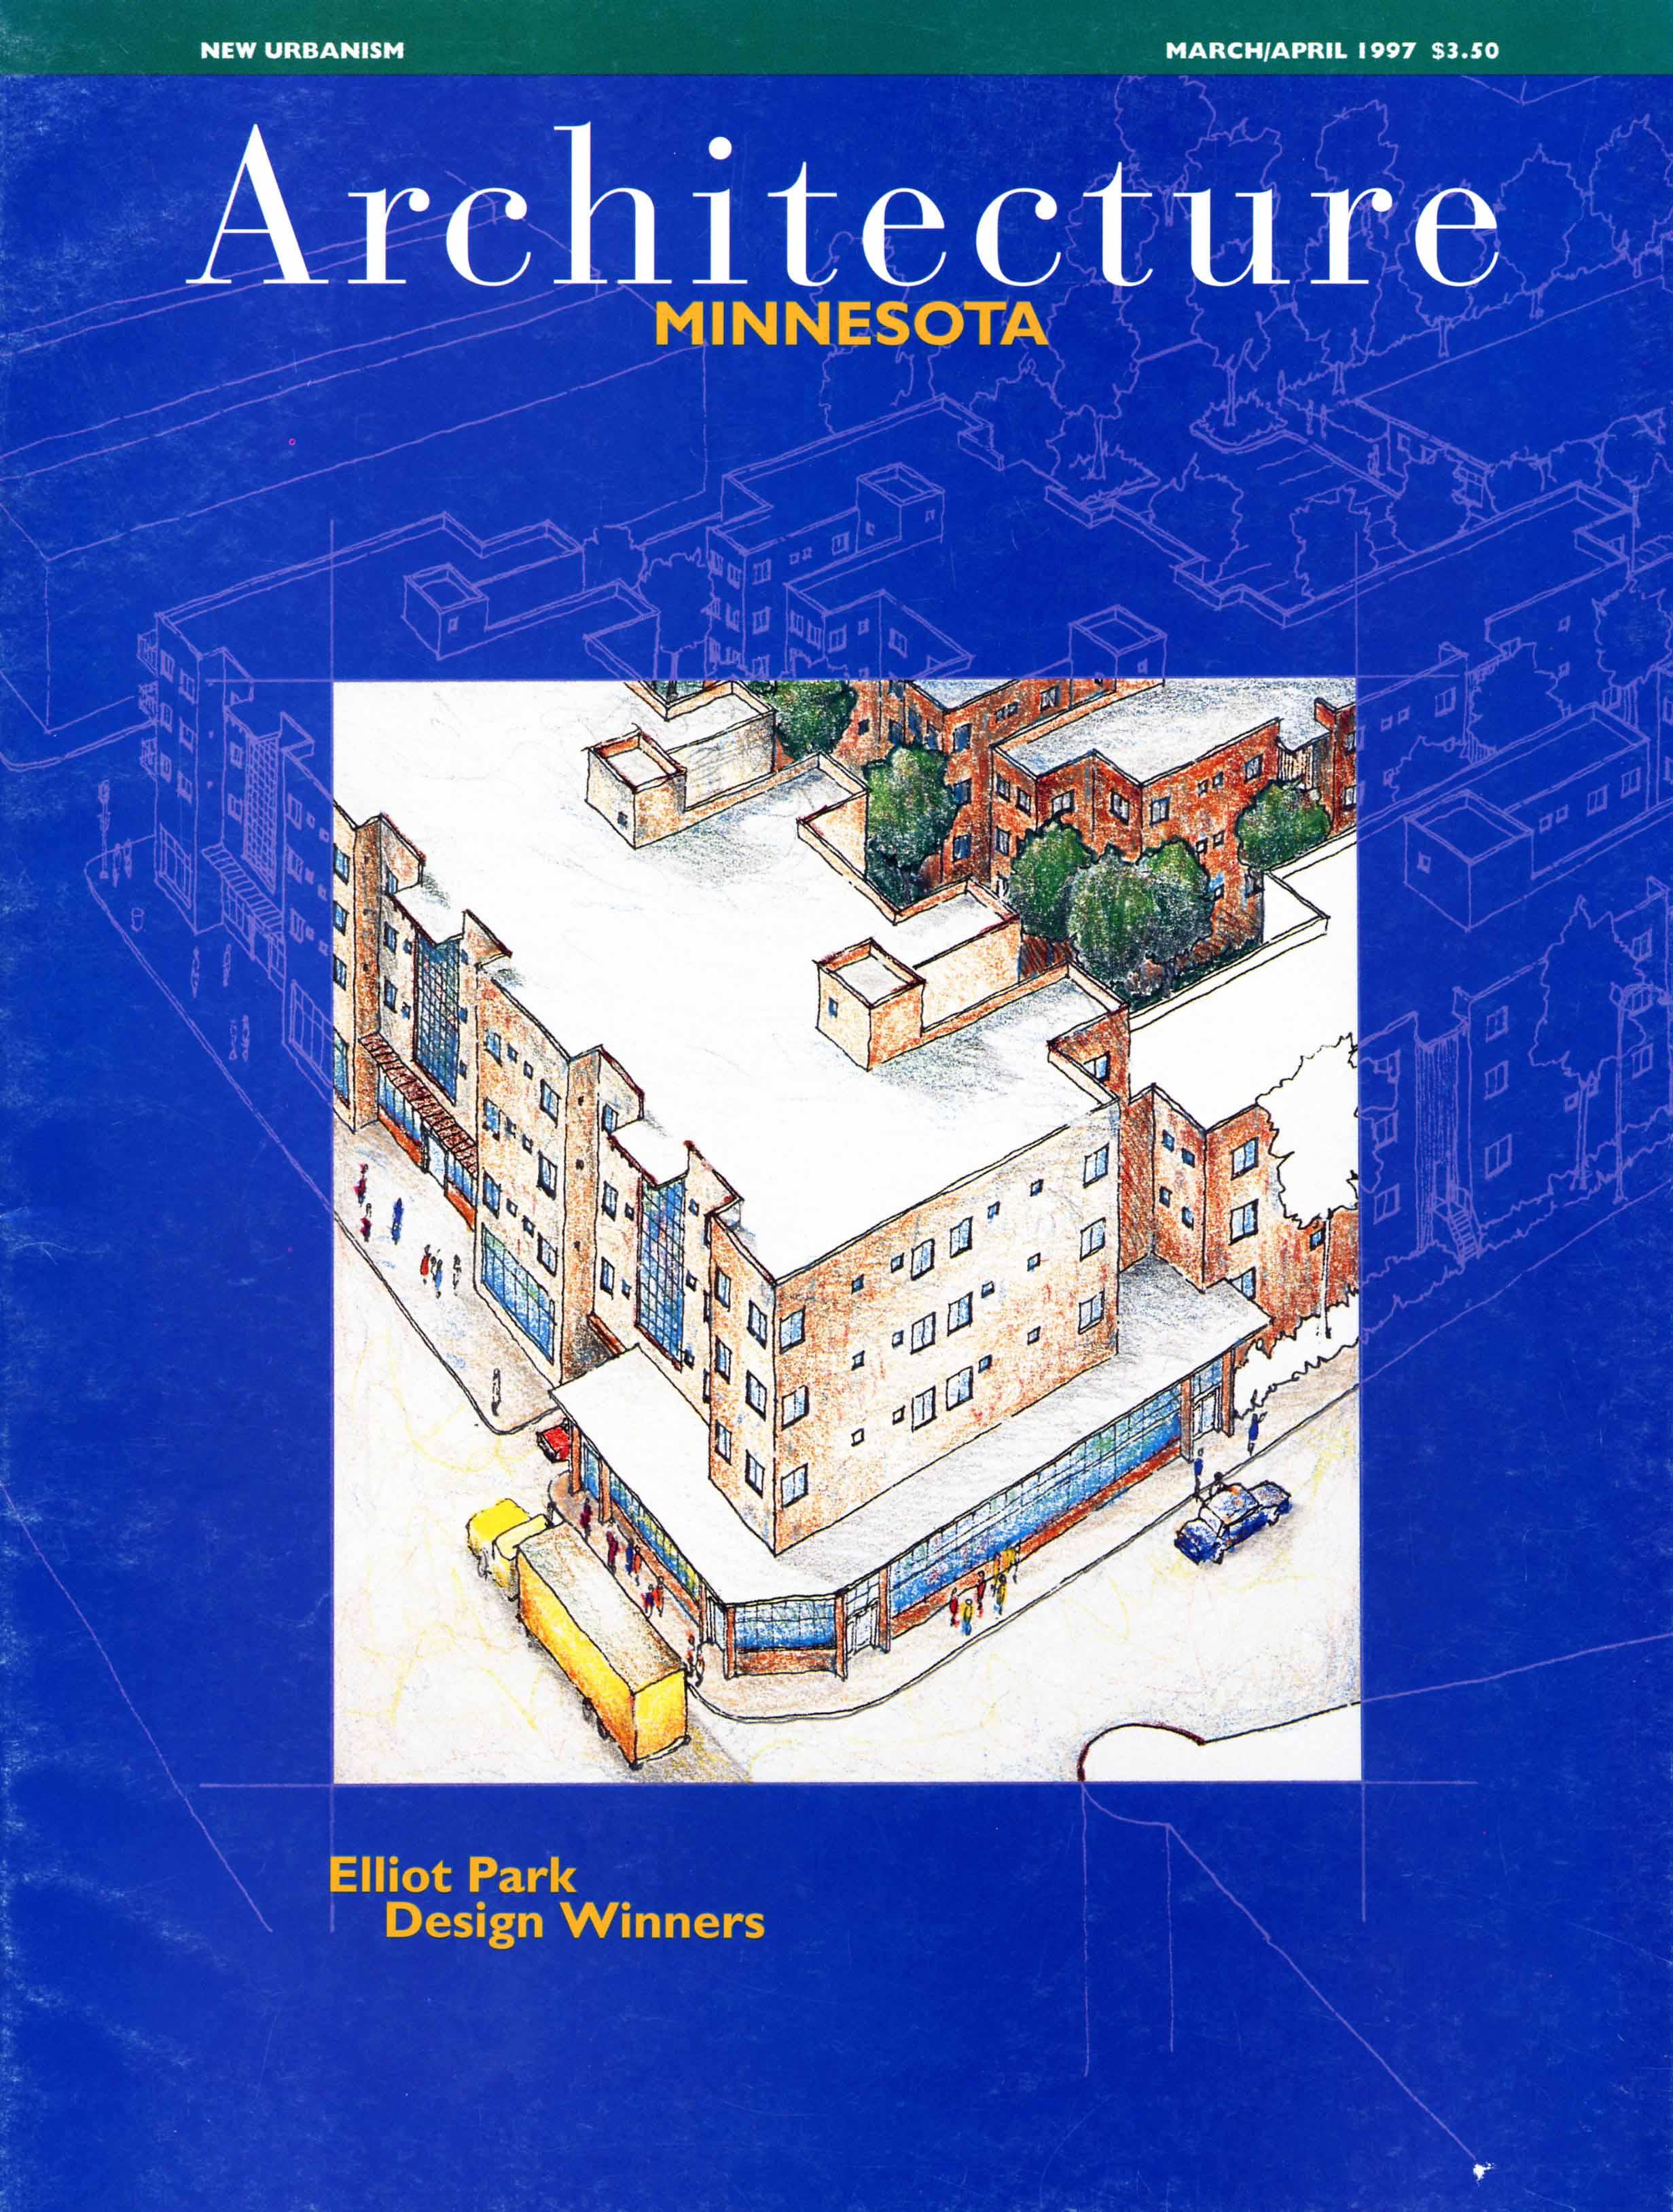 AIA Minnesota Magazine Cover, Elliot Park Neighborhood Competition, 1997